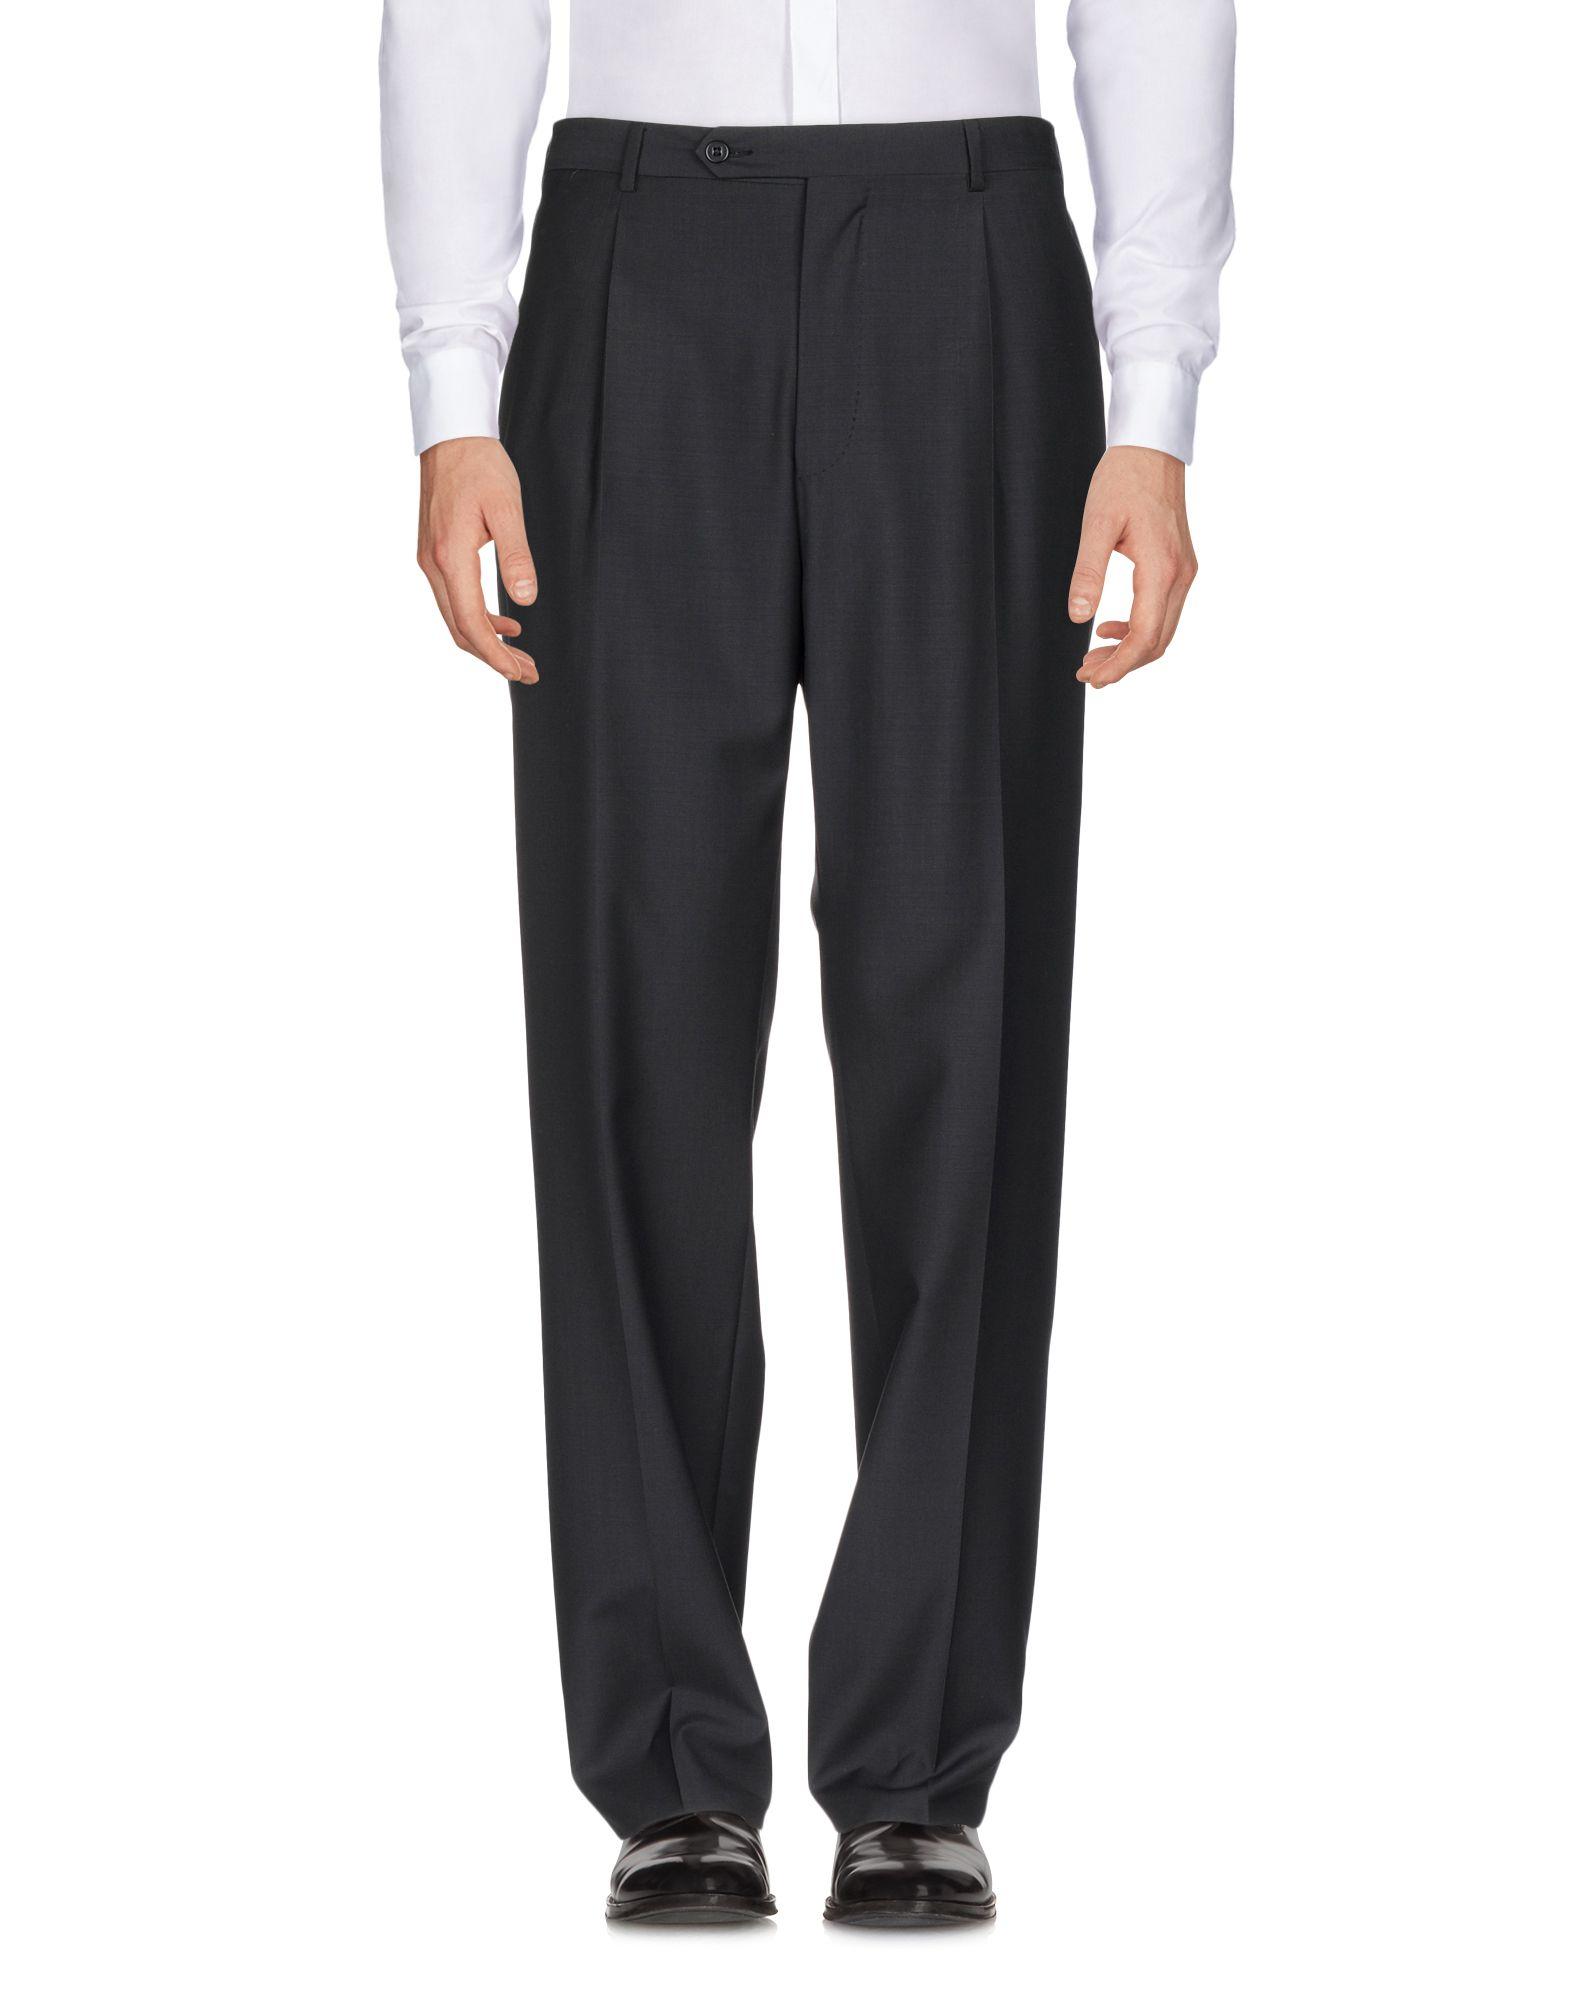 Pantalone Burberry Uomo - Acquista online su